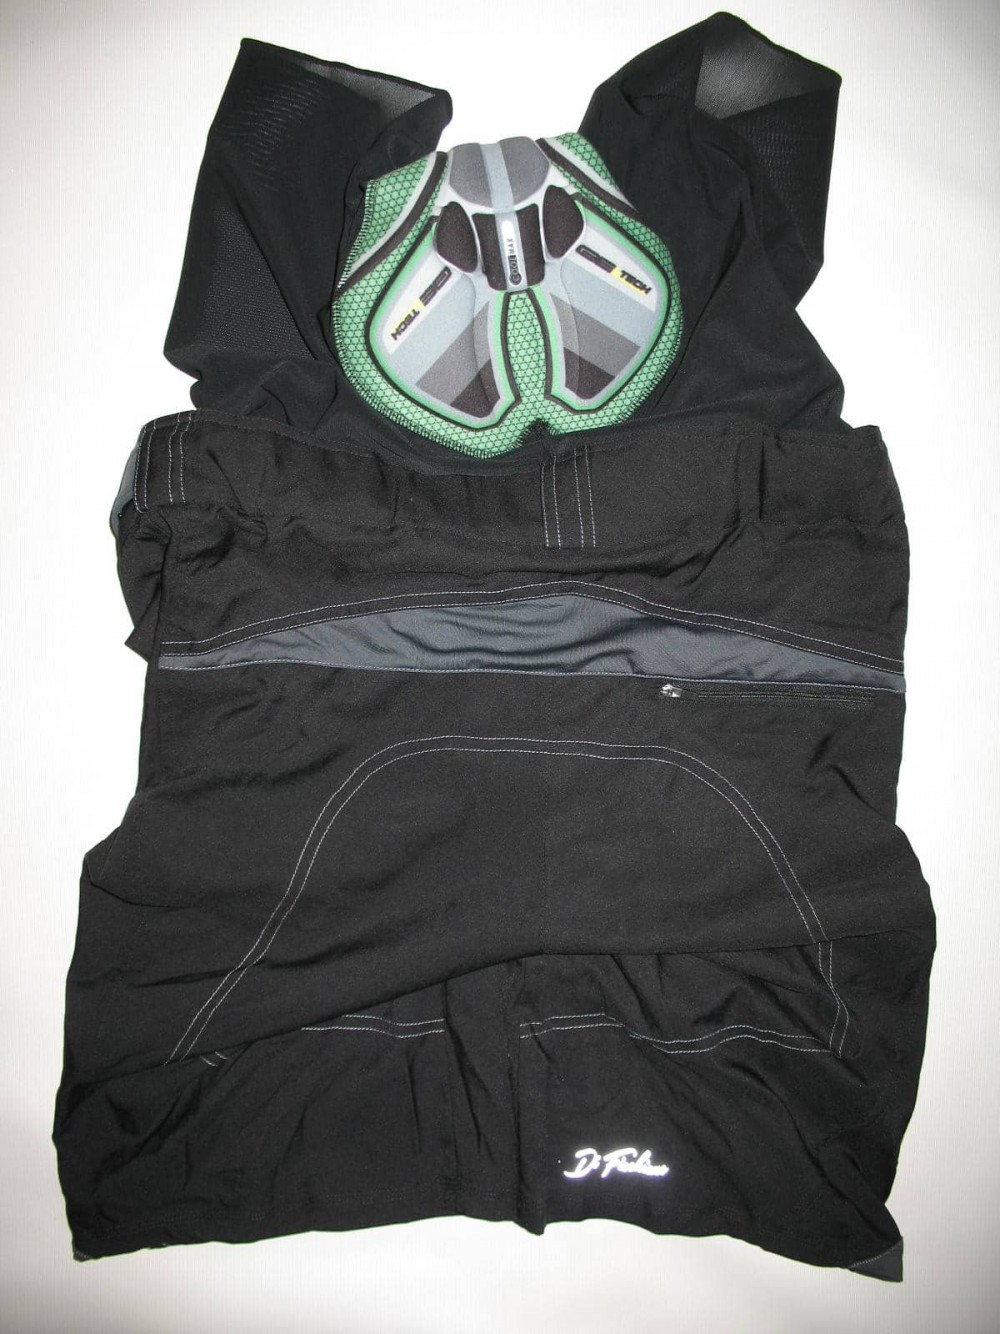 Велошорты DI FICCHIANO lecce MTB shorts (размер XXL) - 8